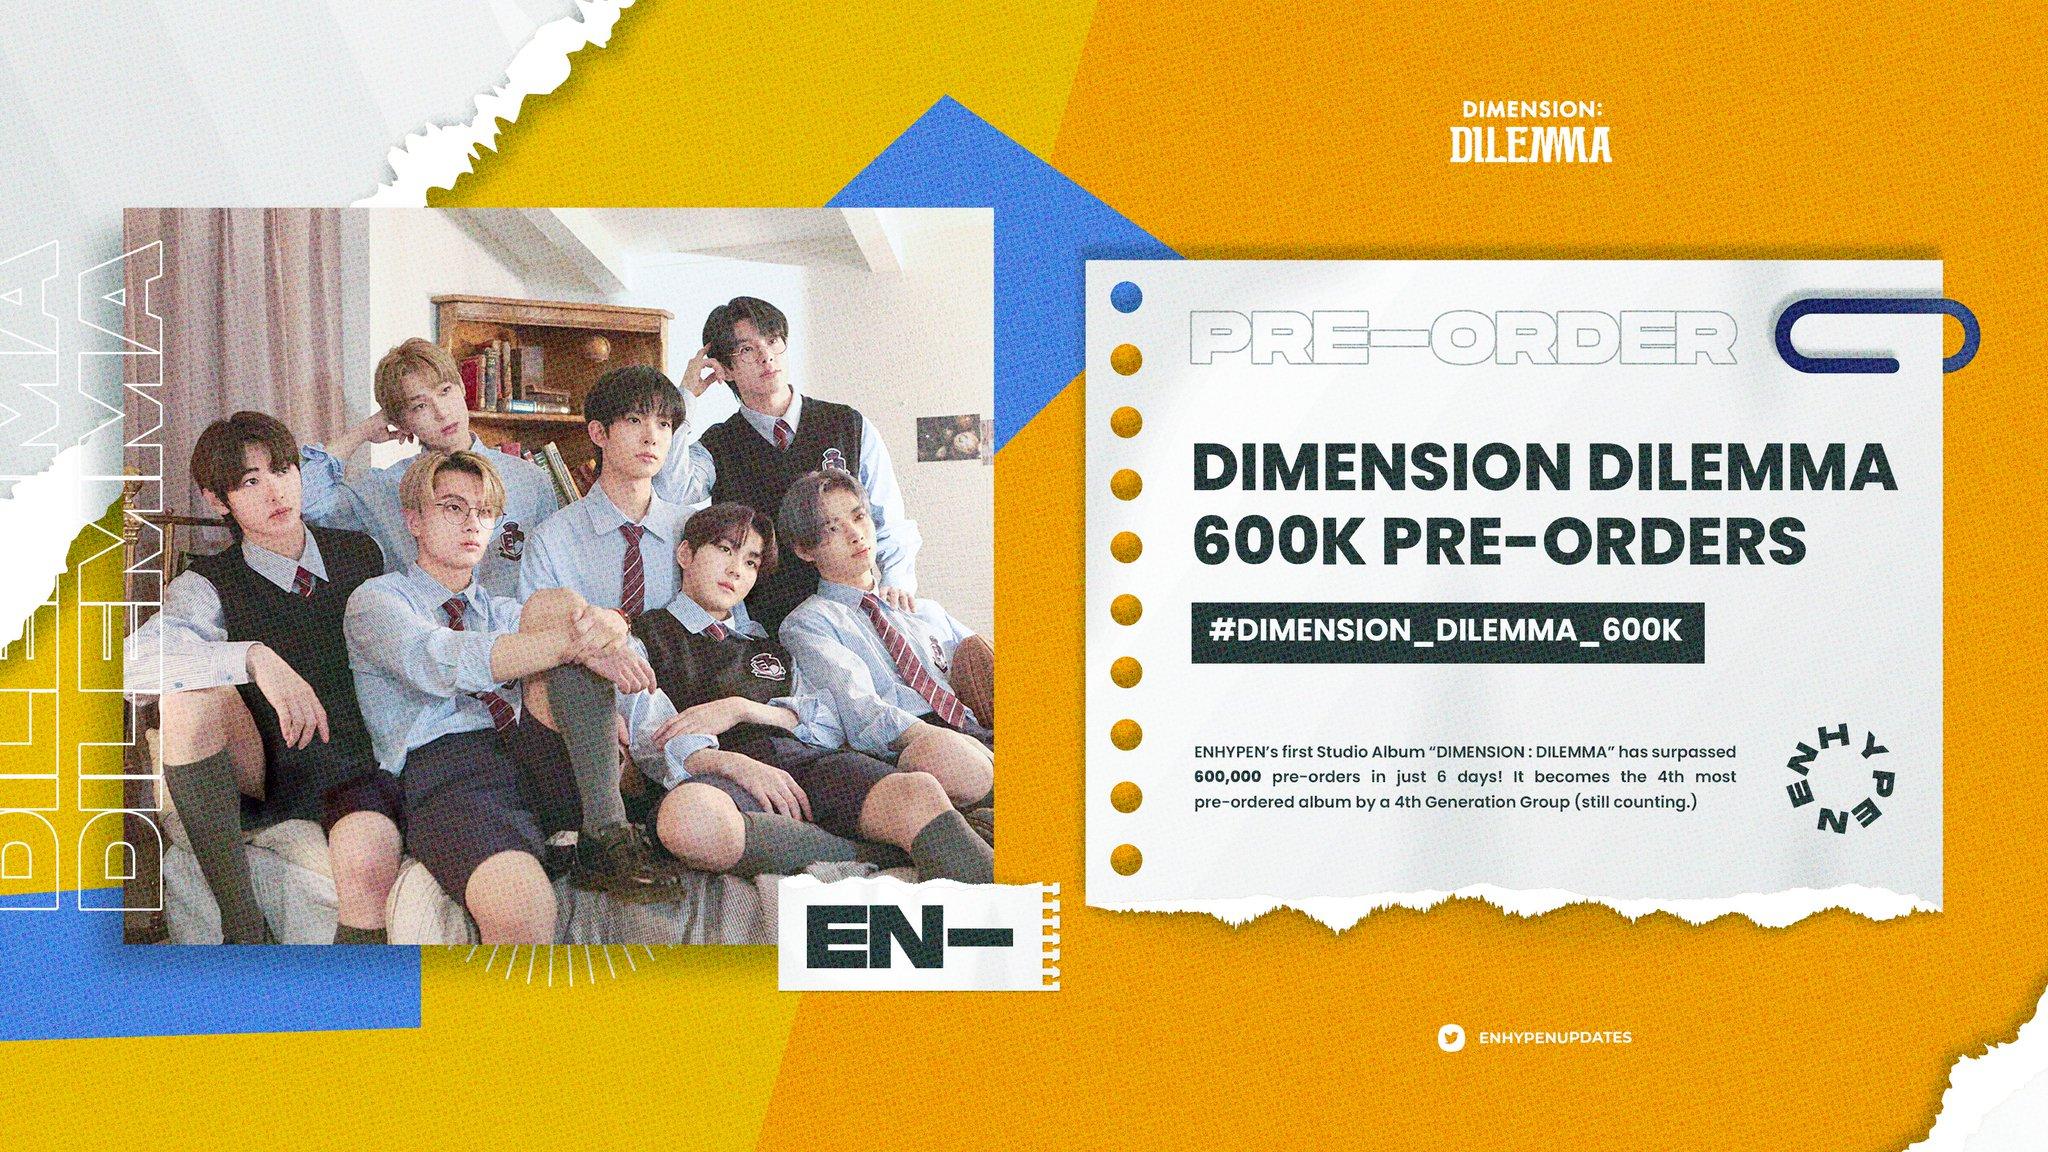 ENHYPEN UPDATES on Twitter ENGENEs ENHYPENs 1st Studio Album 2048x1152